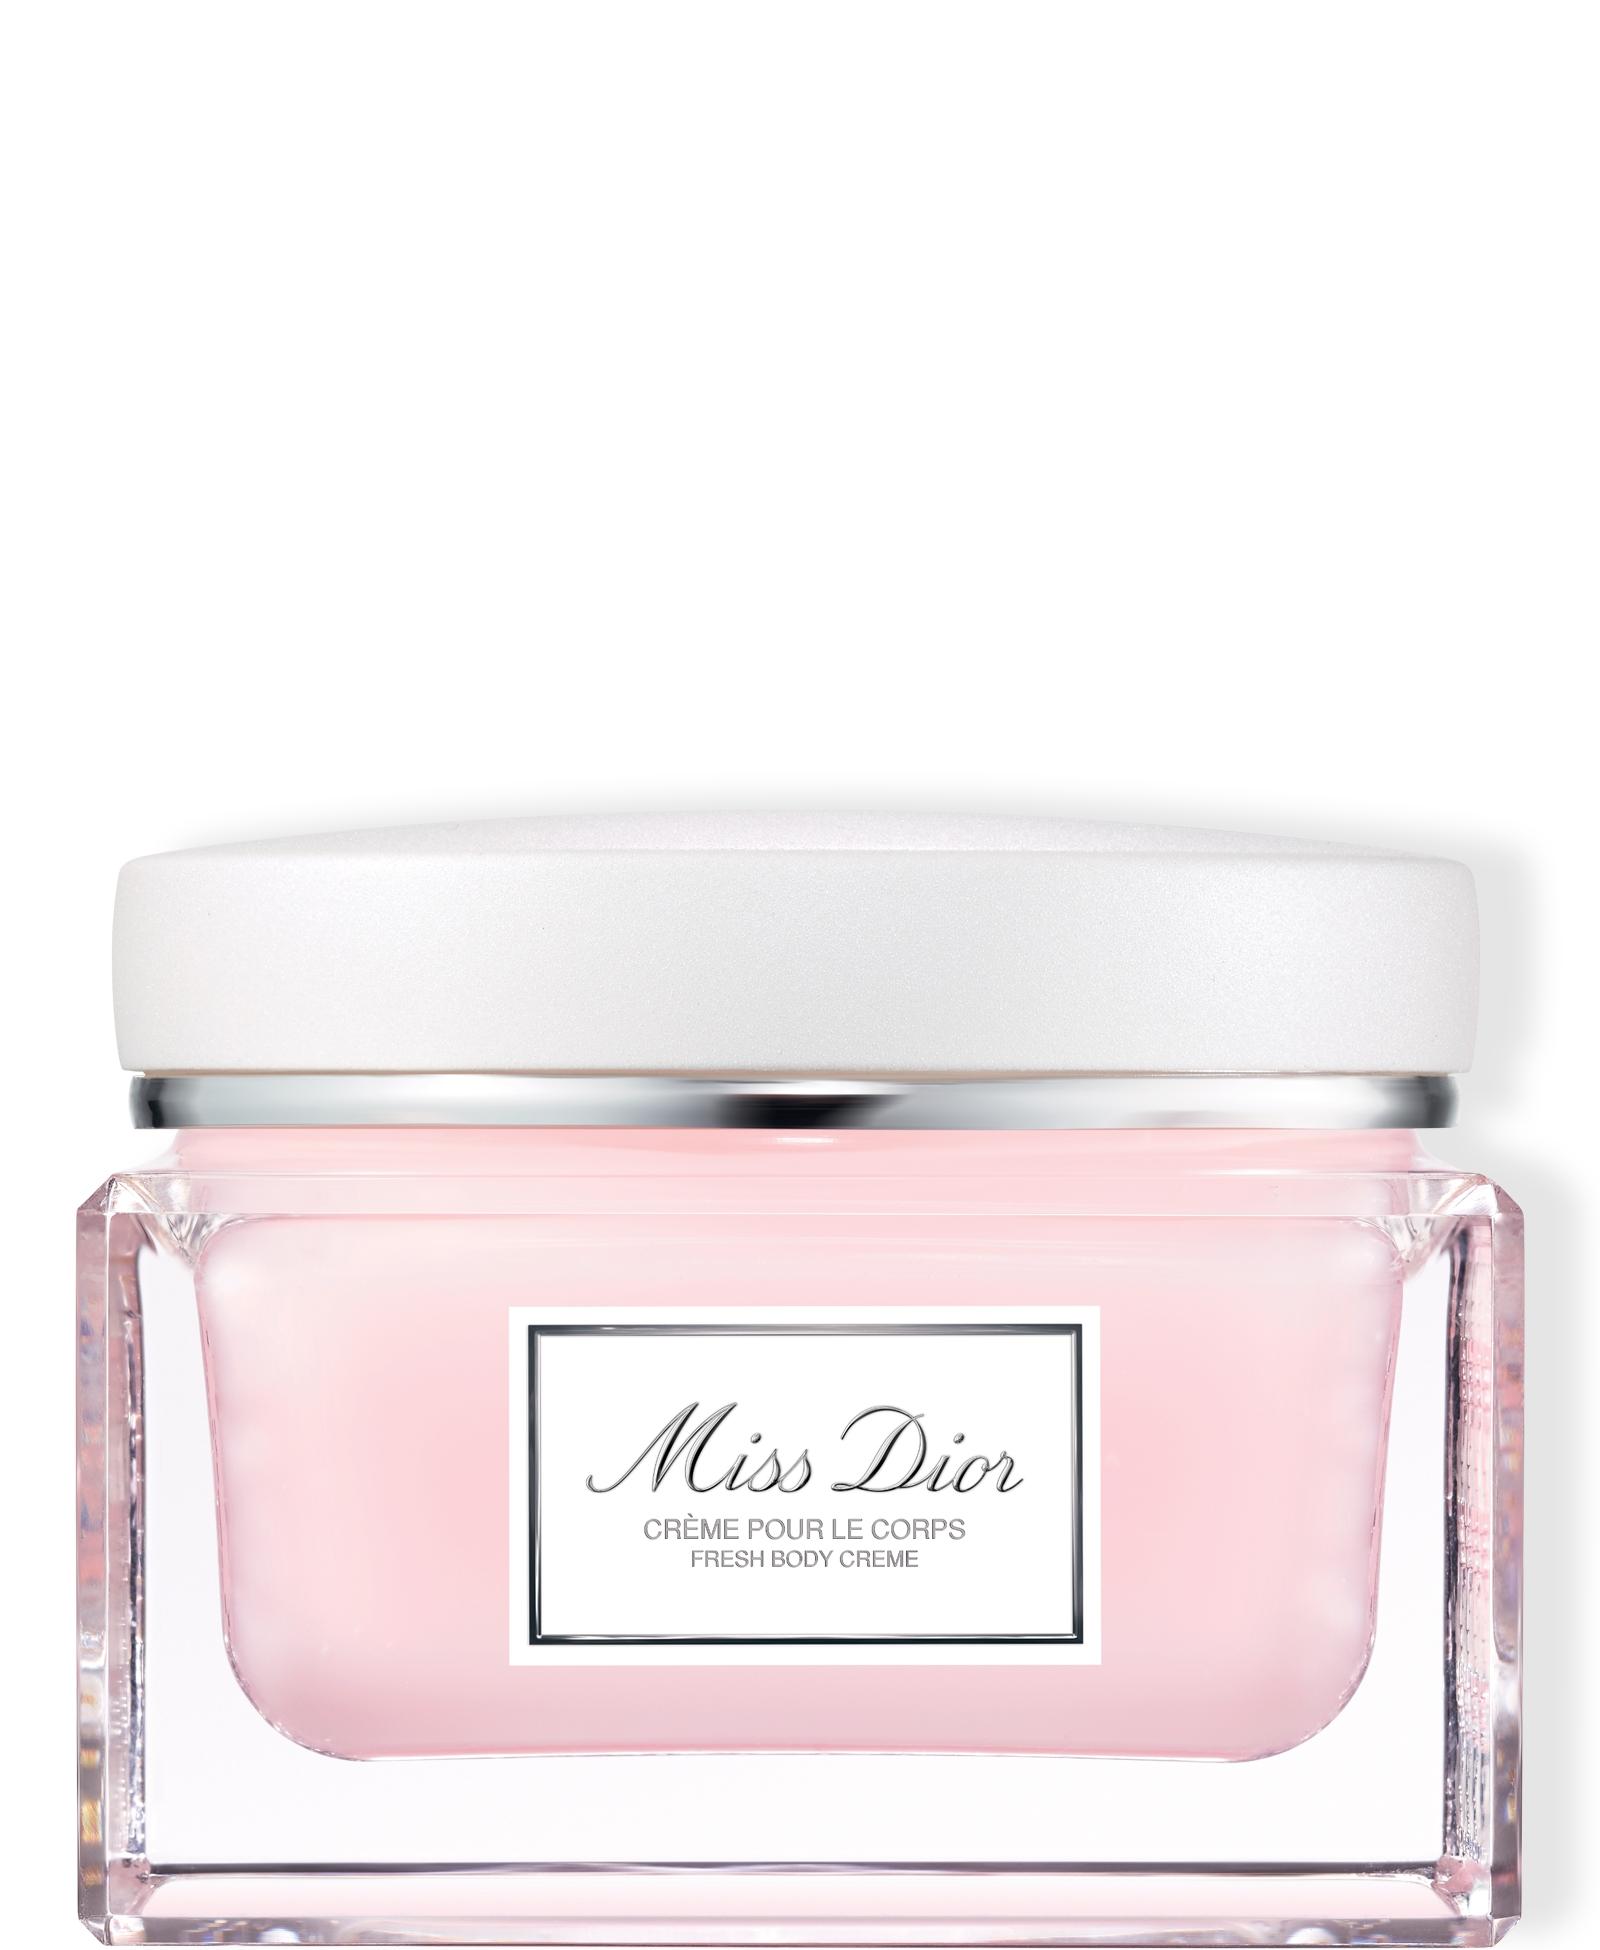 DIOR Miss Dior Body Creme, 150 ml